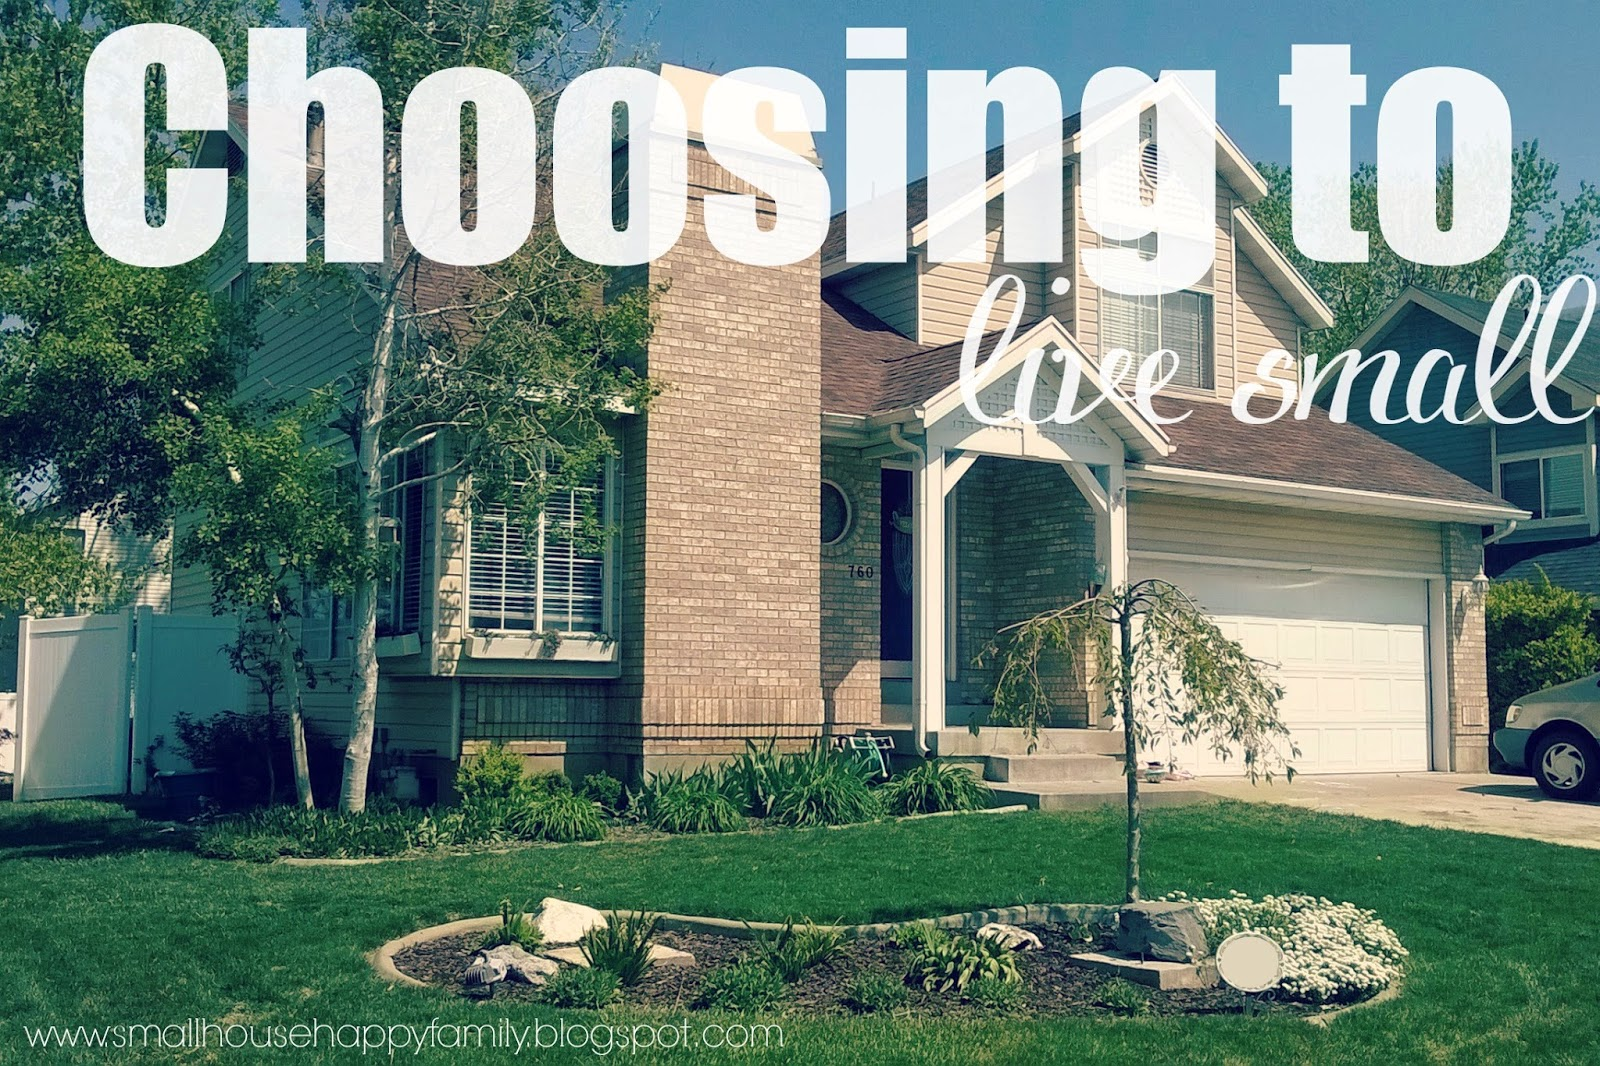 #livesmall #fullhousefullhearts www.smallhousehappyfamily.blogspot.com